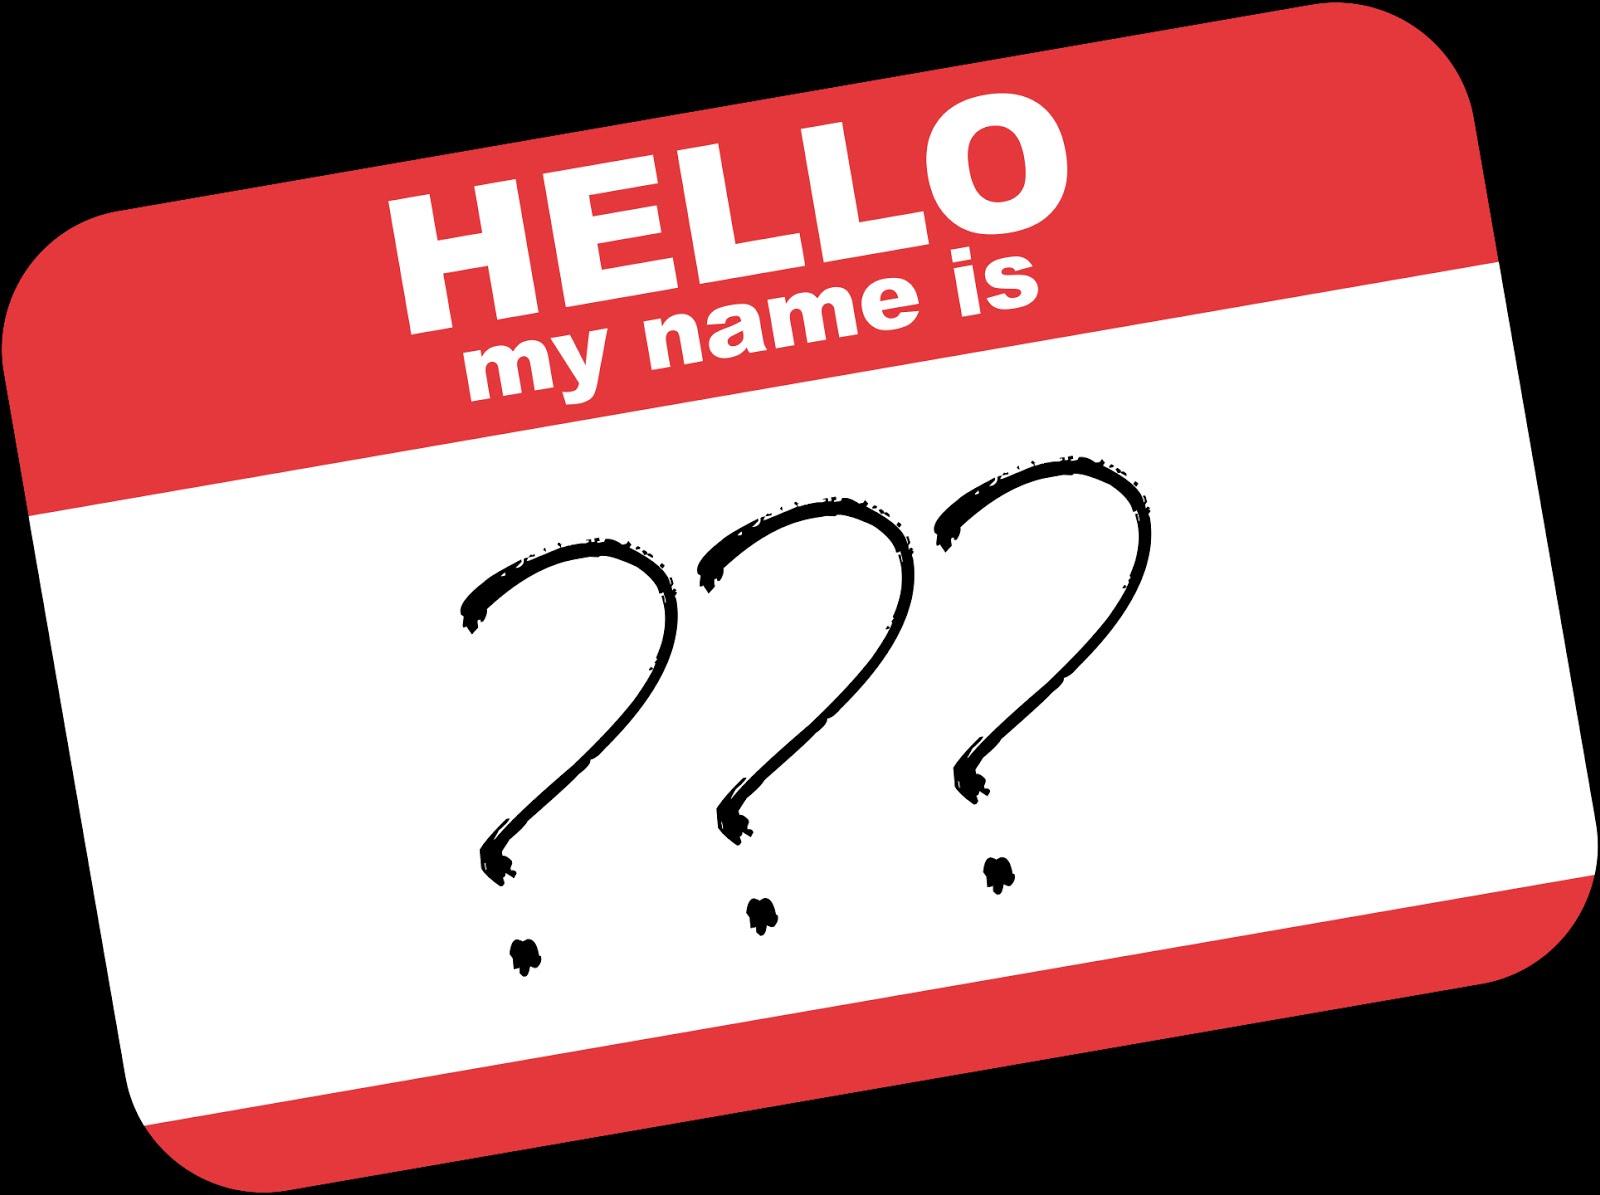 name-change.jpg